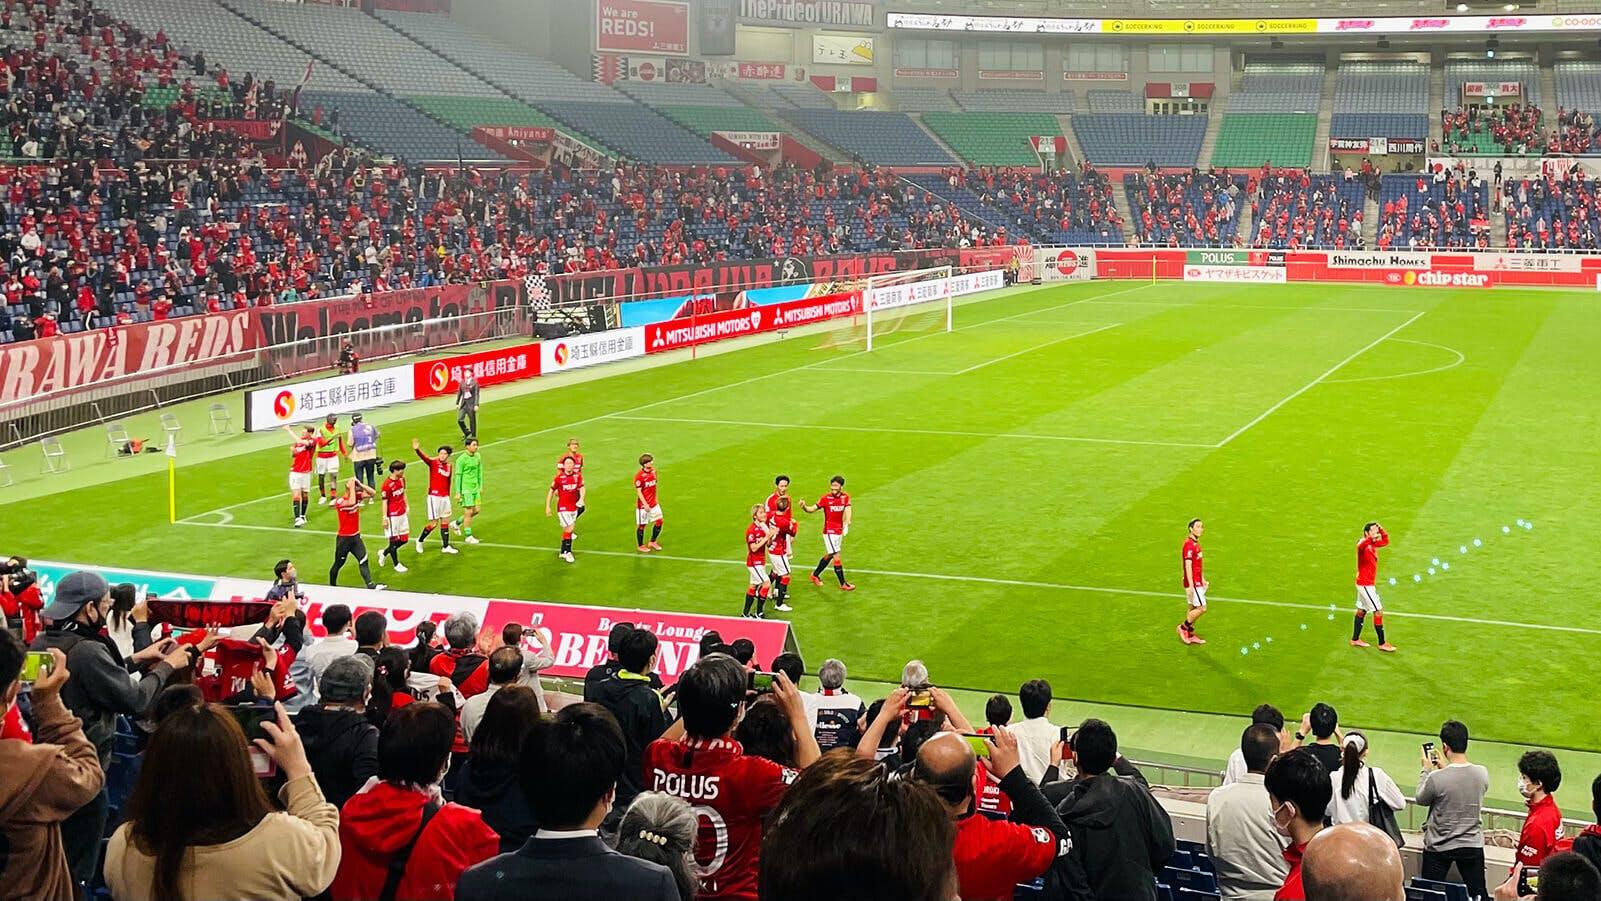 2021 Jリーグ YBC ルヴァンカップ グループステージ 第6節 埼玉スタジアム2002 横浜FC戦 試合終了後